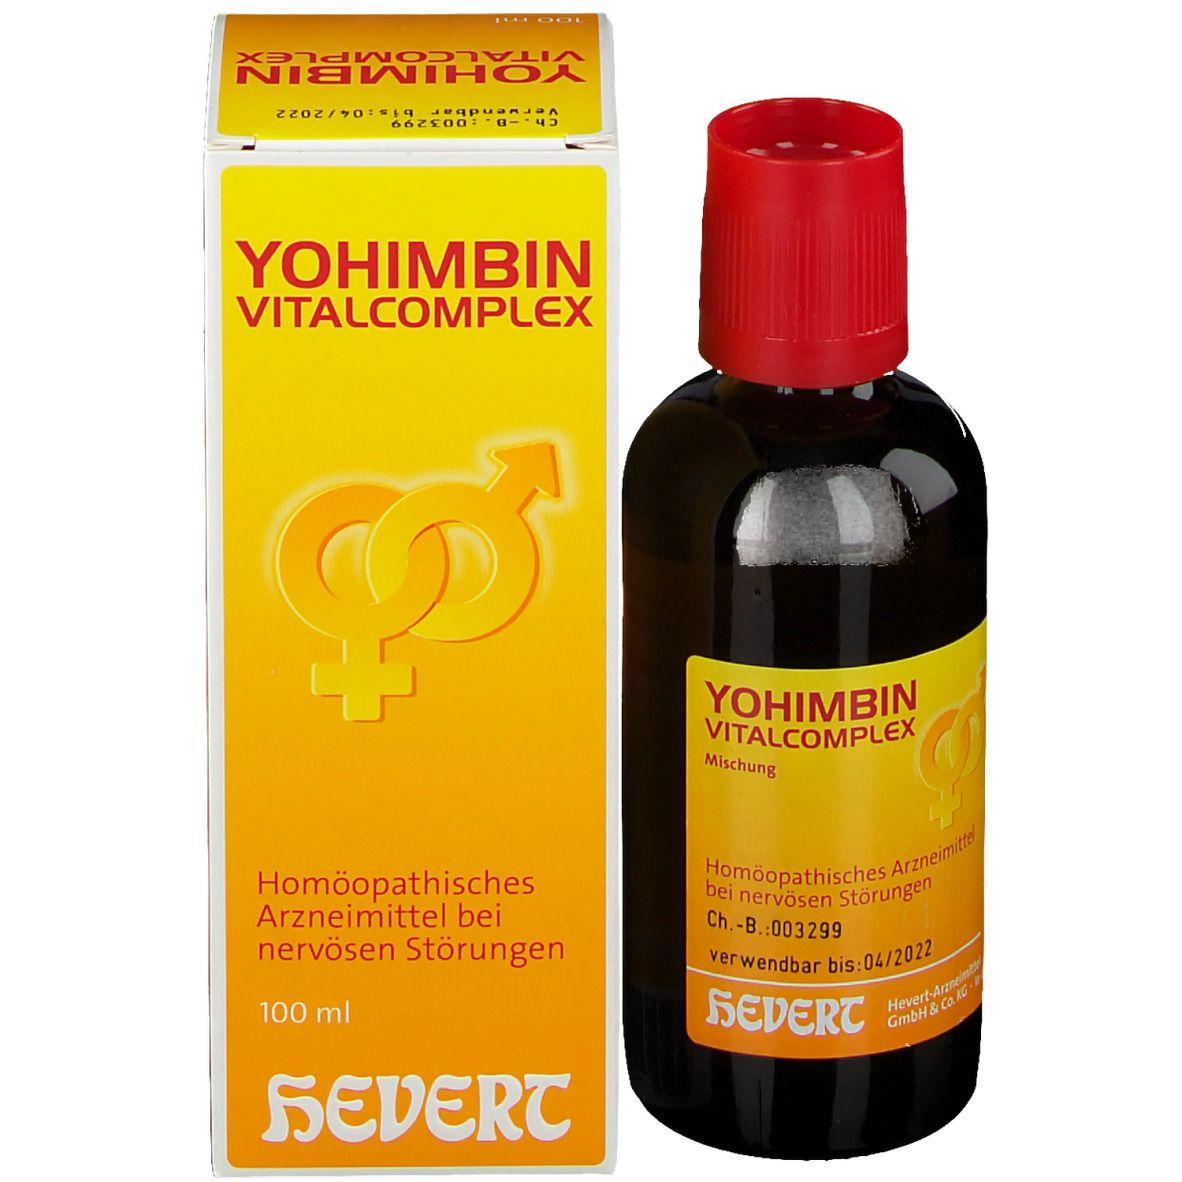 YOHIMBIN VITALCOMPLEX HEVERT®